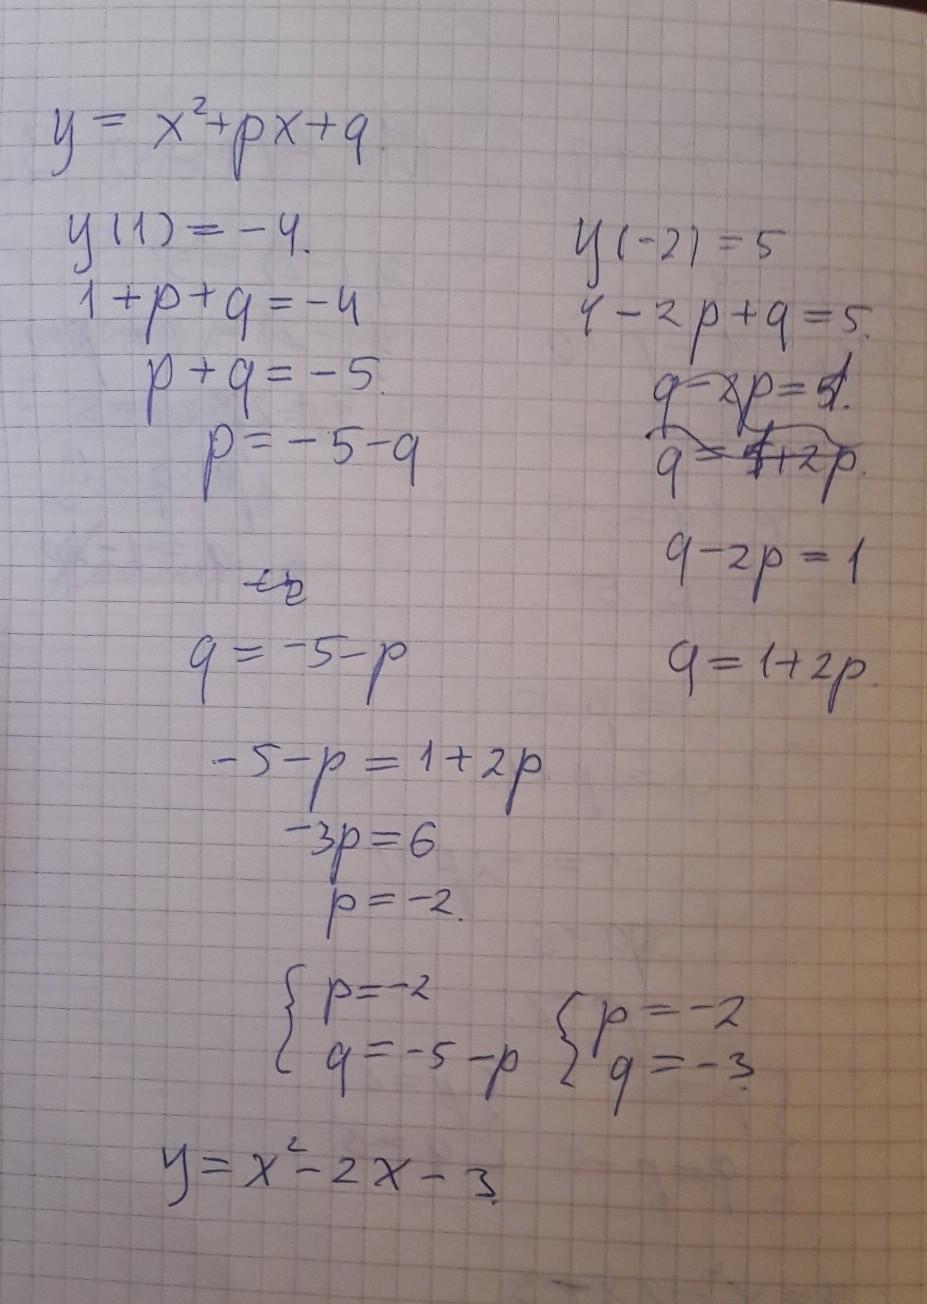 При каких значениях p и q график функции y=x2+px+q